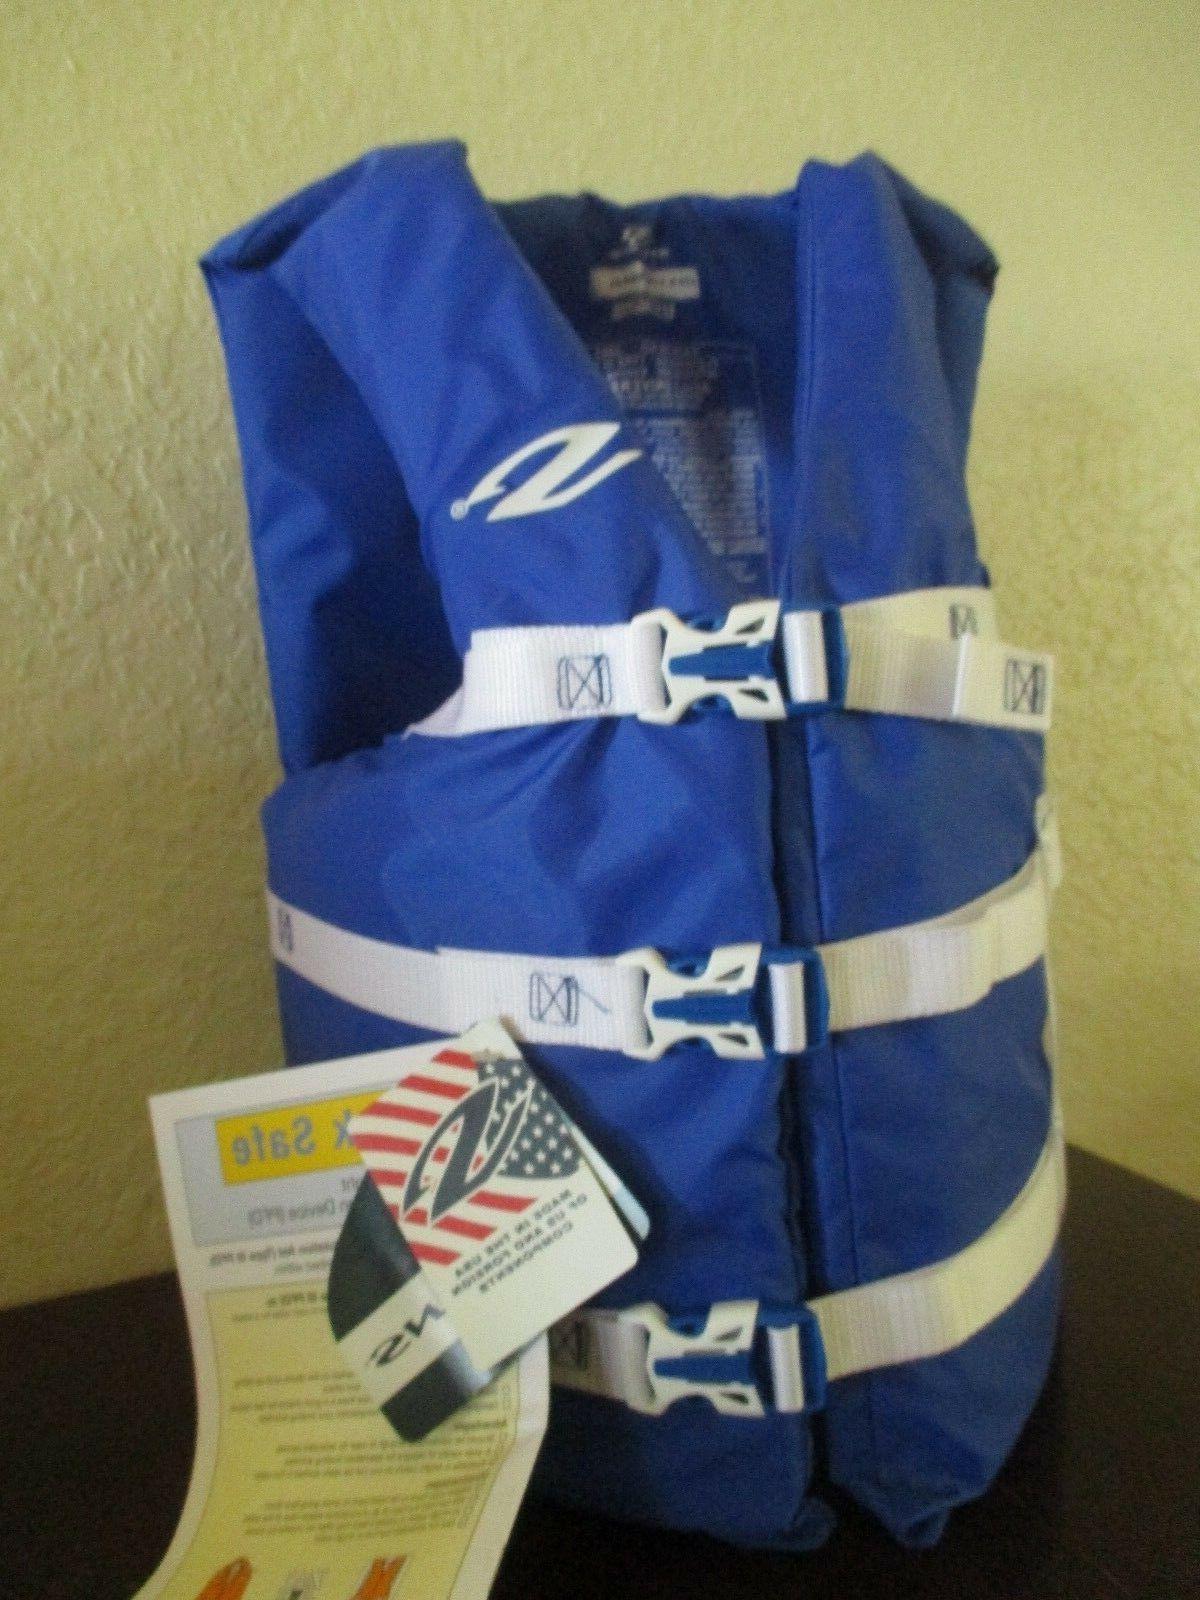 coleman adult classic series universal life jacket